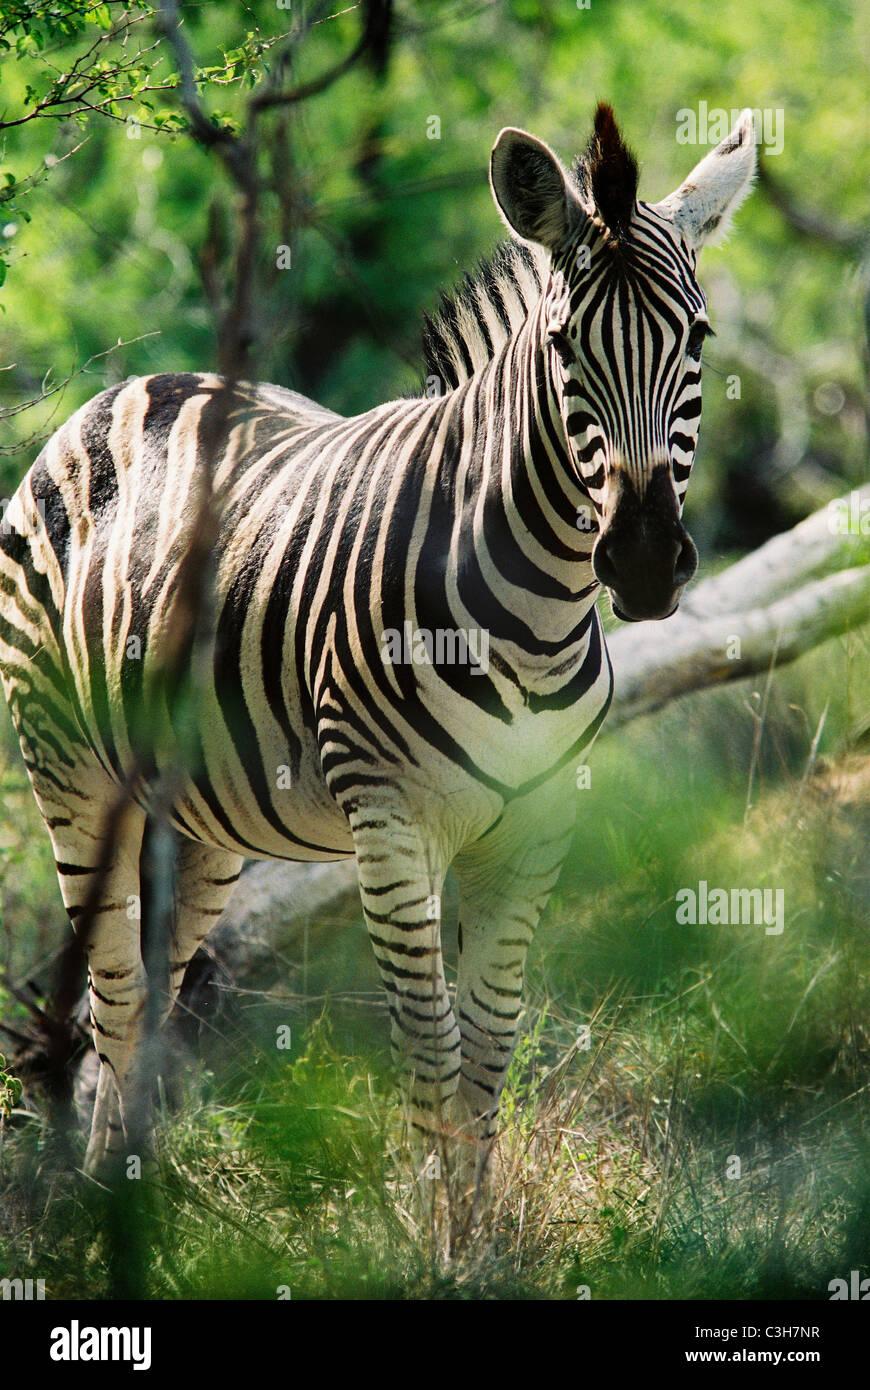 Zebra Burchell's zebra (Equus burchellii) Mala mala South Africa - Stock Image